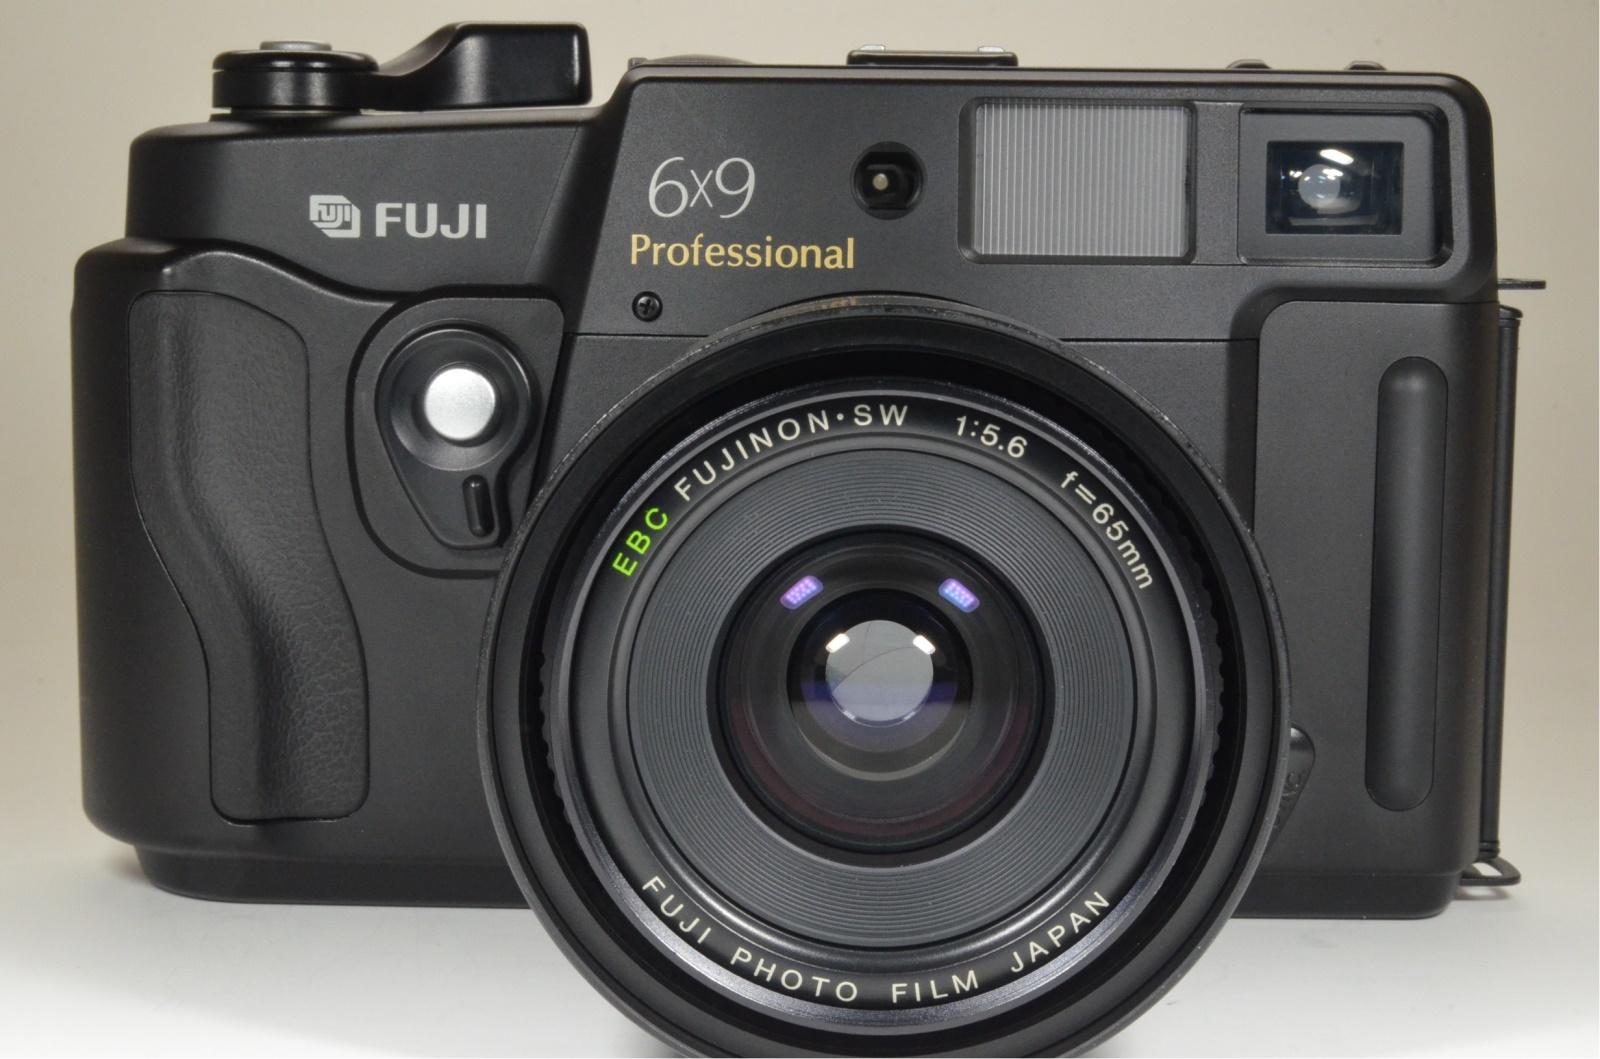 fuji fujifilm gsw690iii 65mm f5.6 count '032' medium format camera